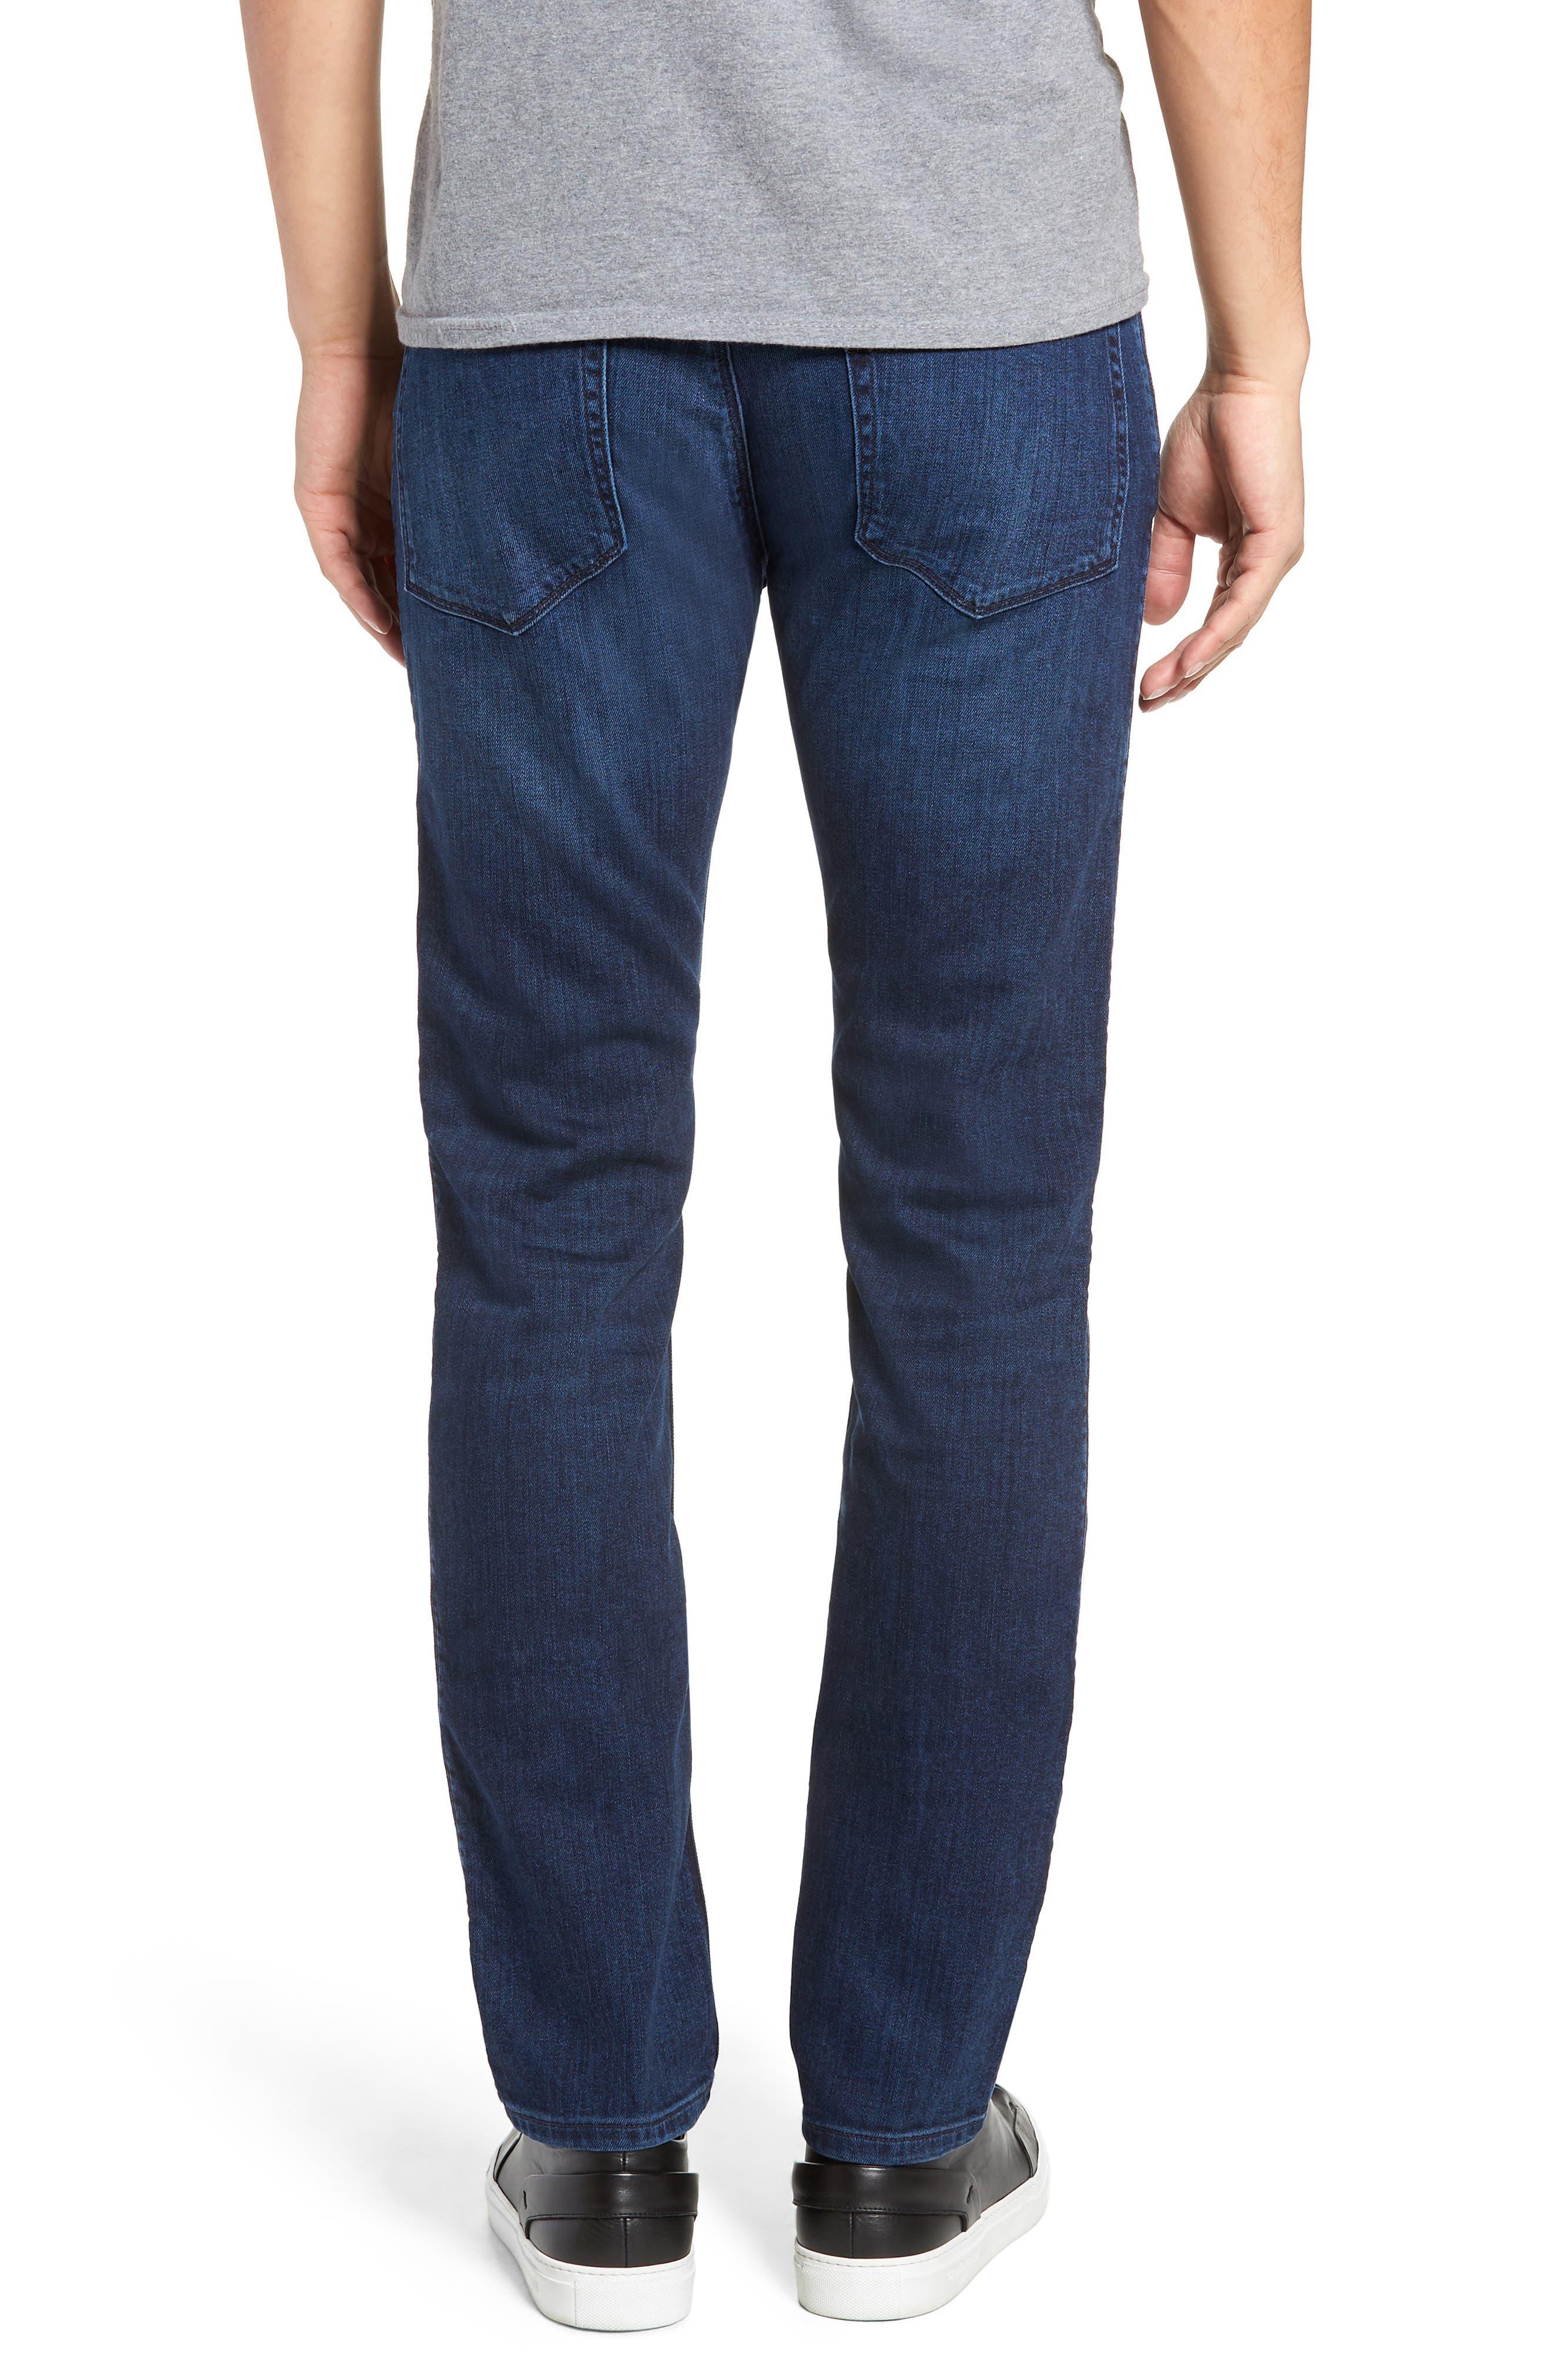 708 Stretch Slim Fit Jeans,                             Alternate thumbnail 2, color,                             BLUE